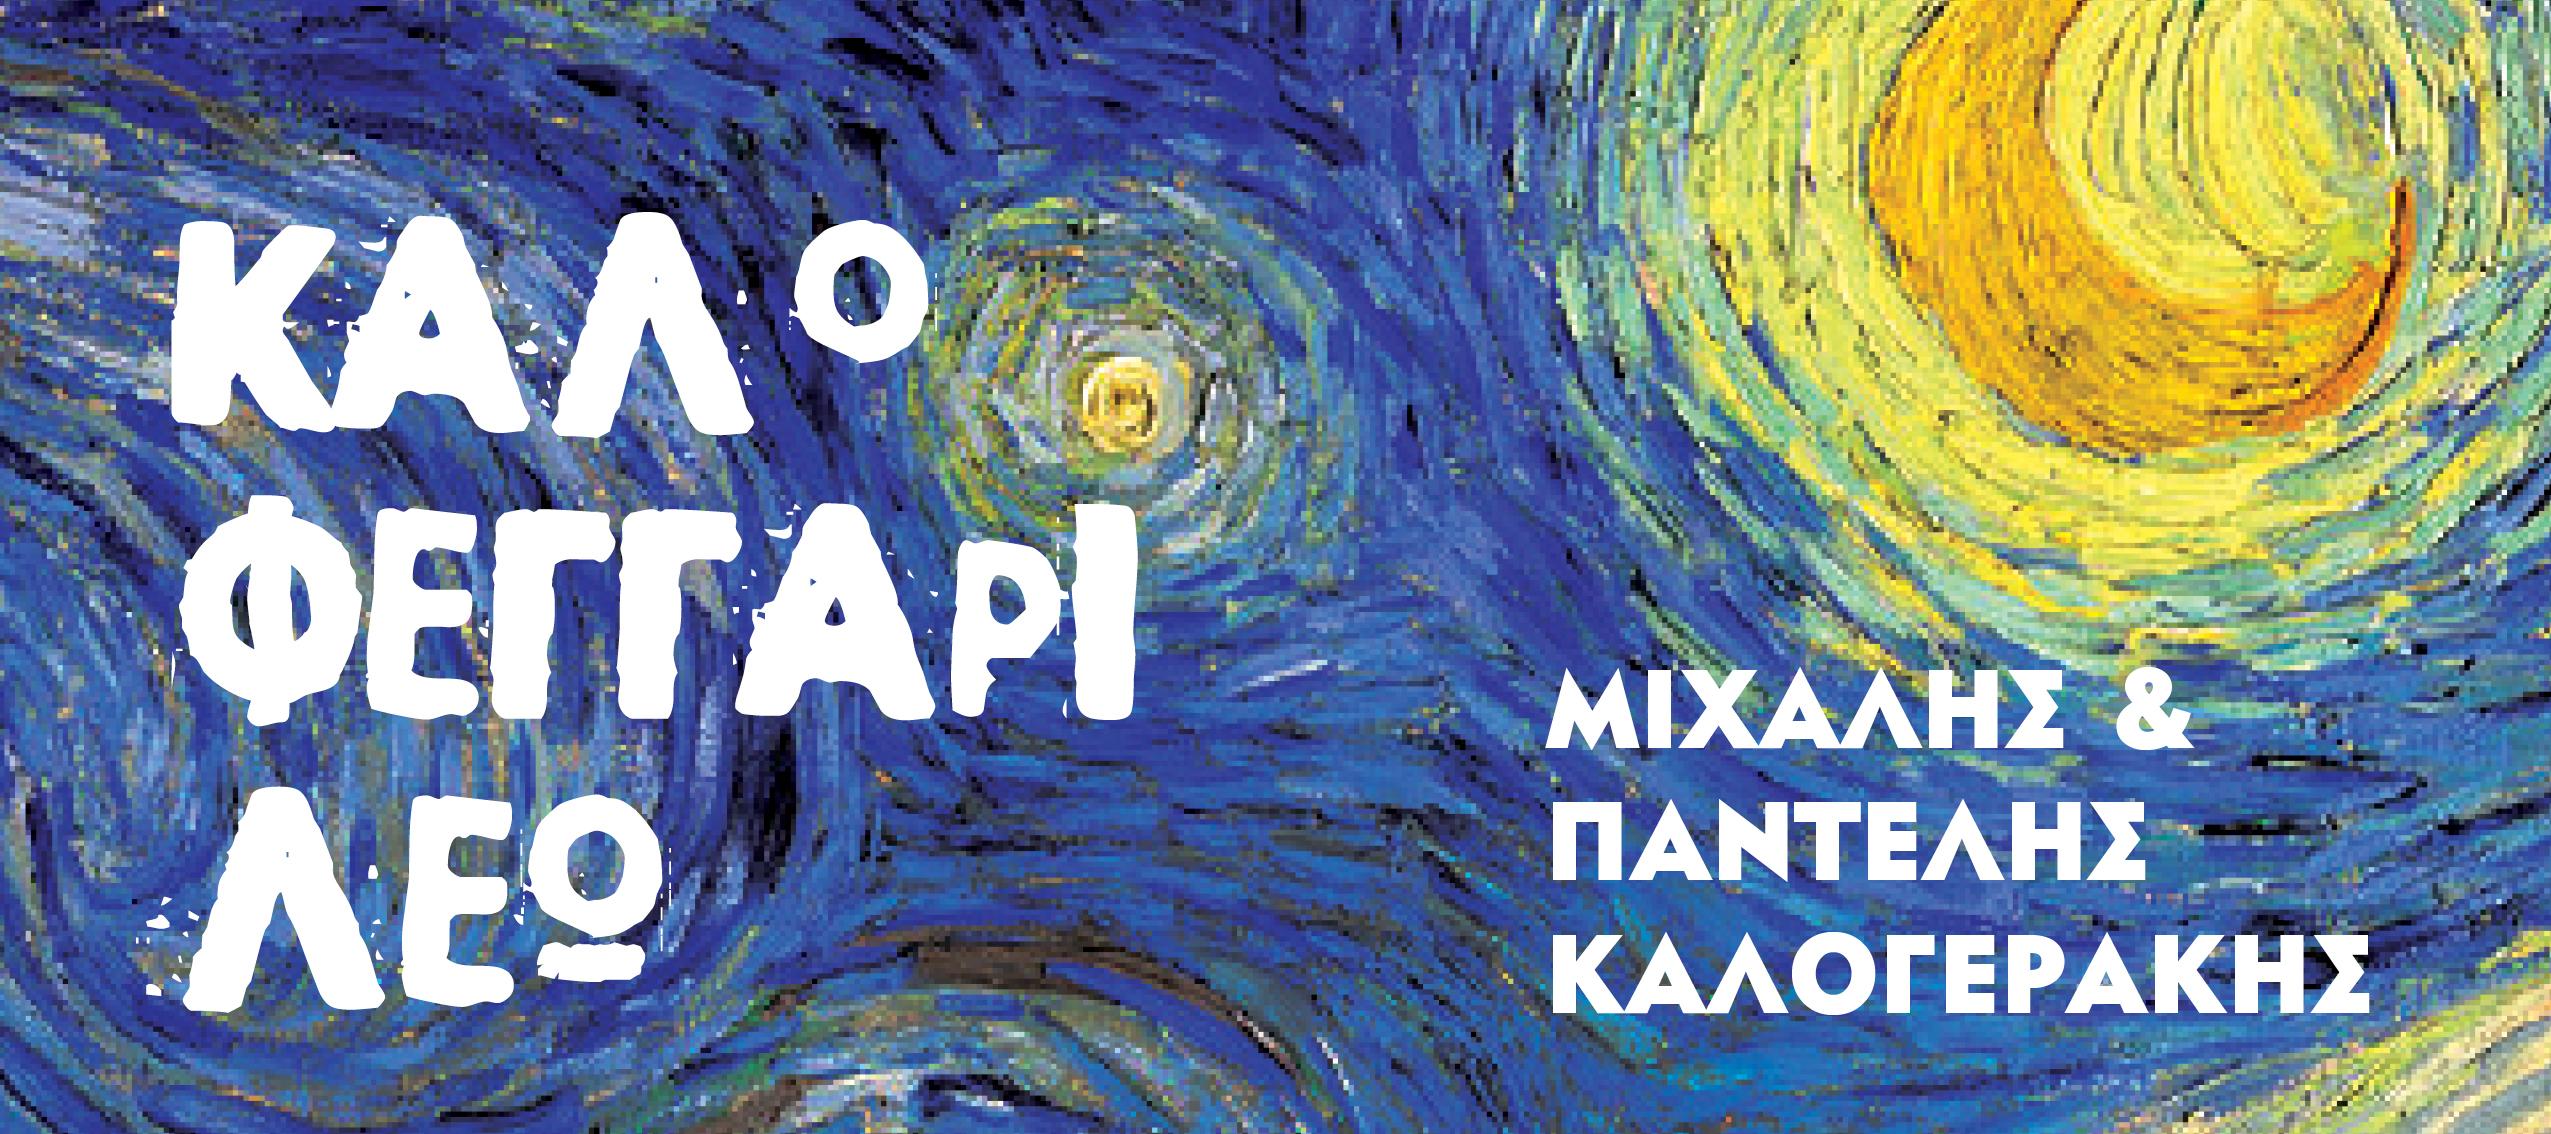 KALO FEGGARI LEW 900Χ400-ΝΕΑ